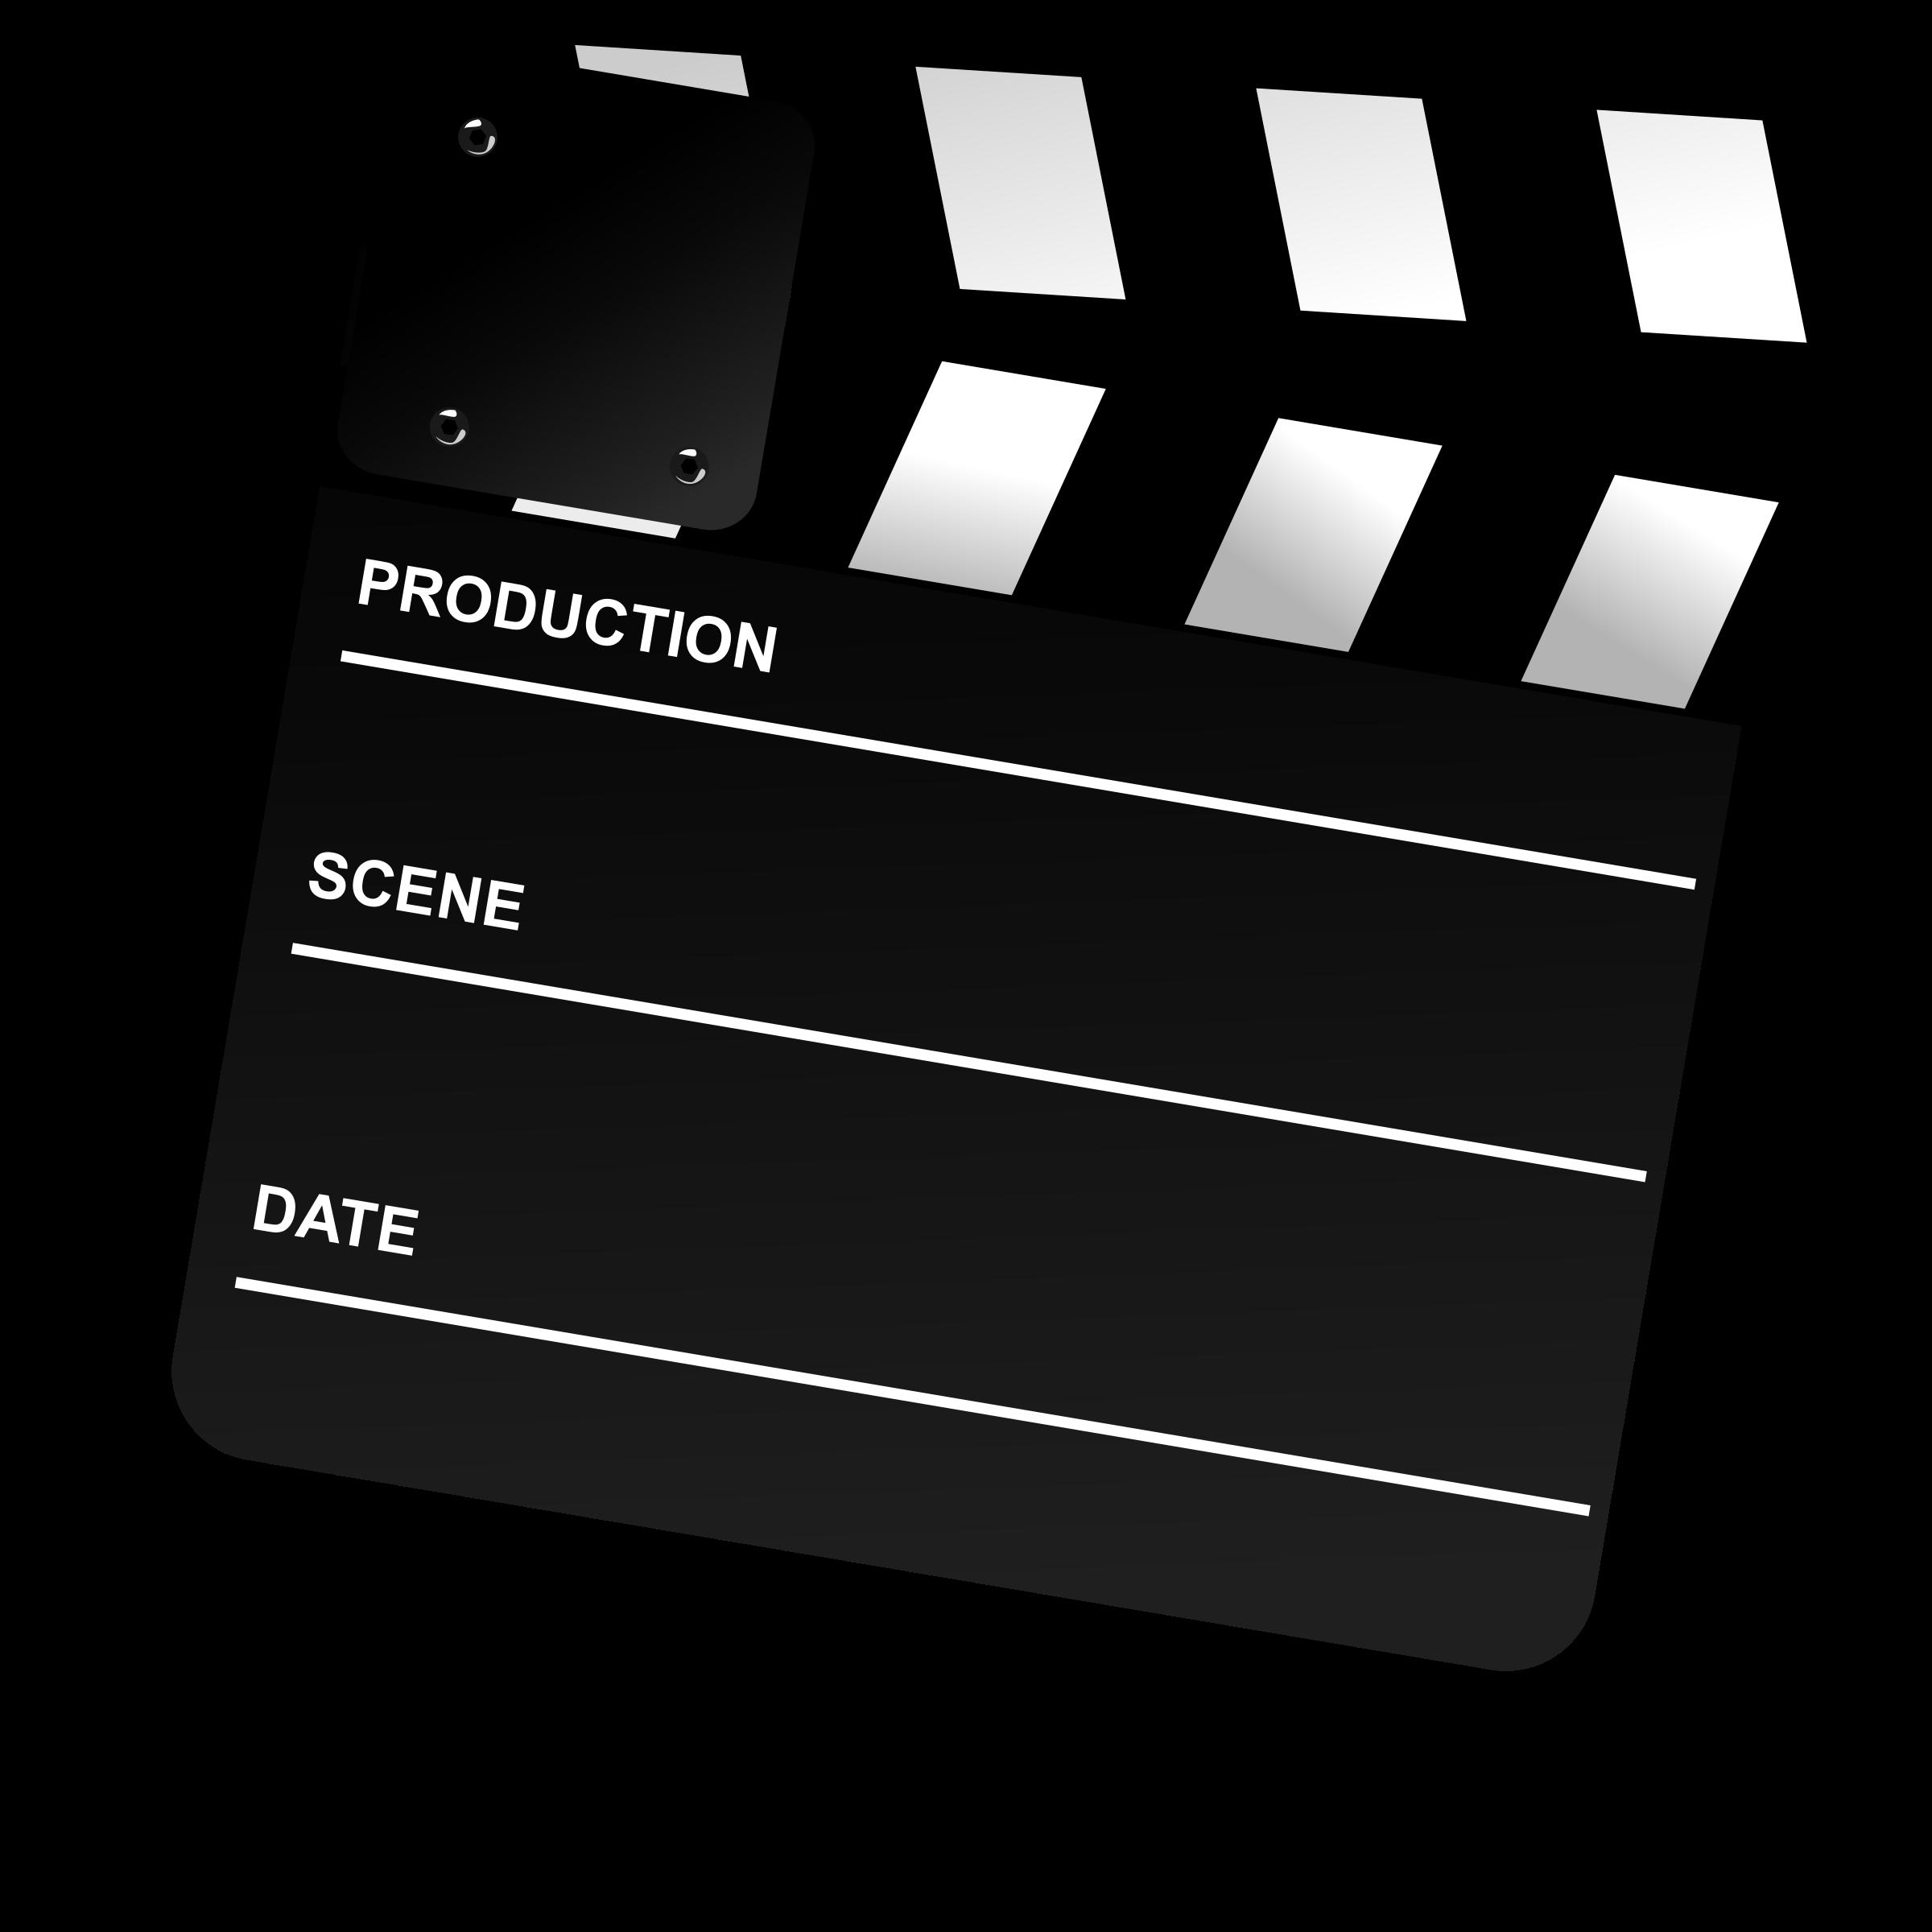 Movie Clapper Board By Gnokii Clip Art Public Domain Images Film